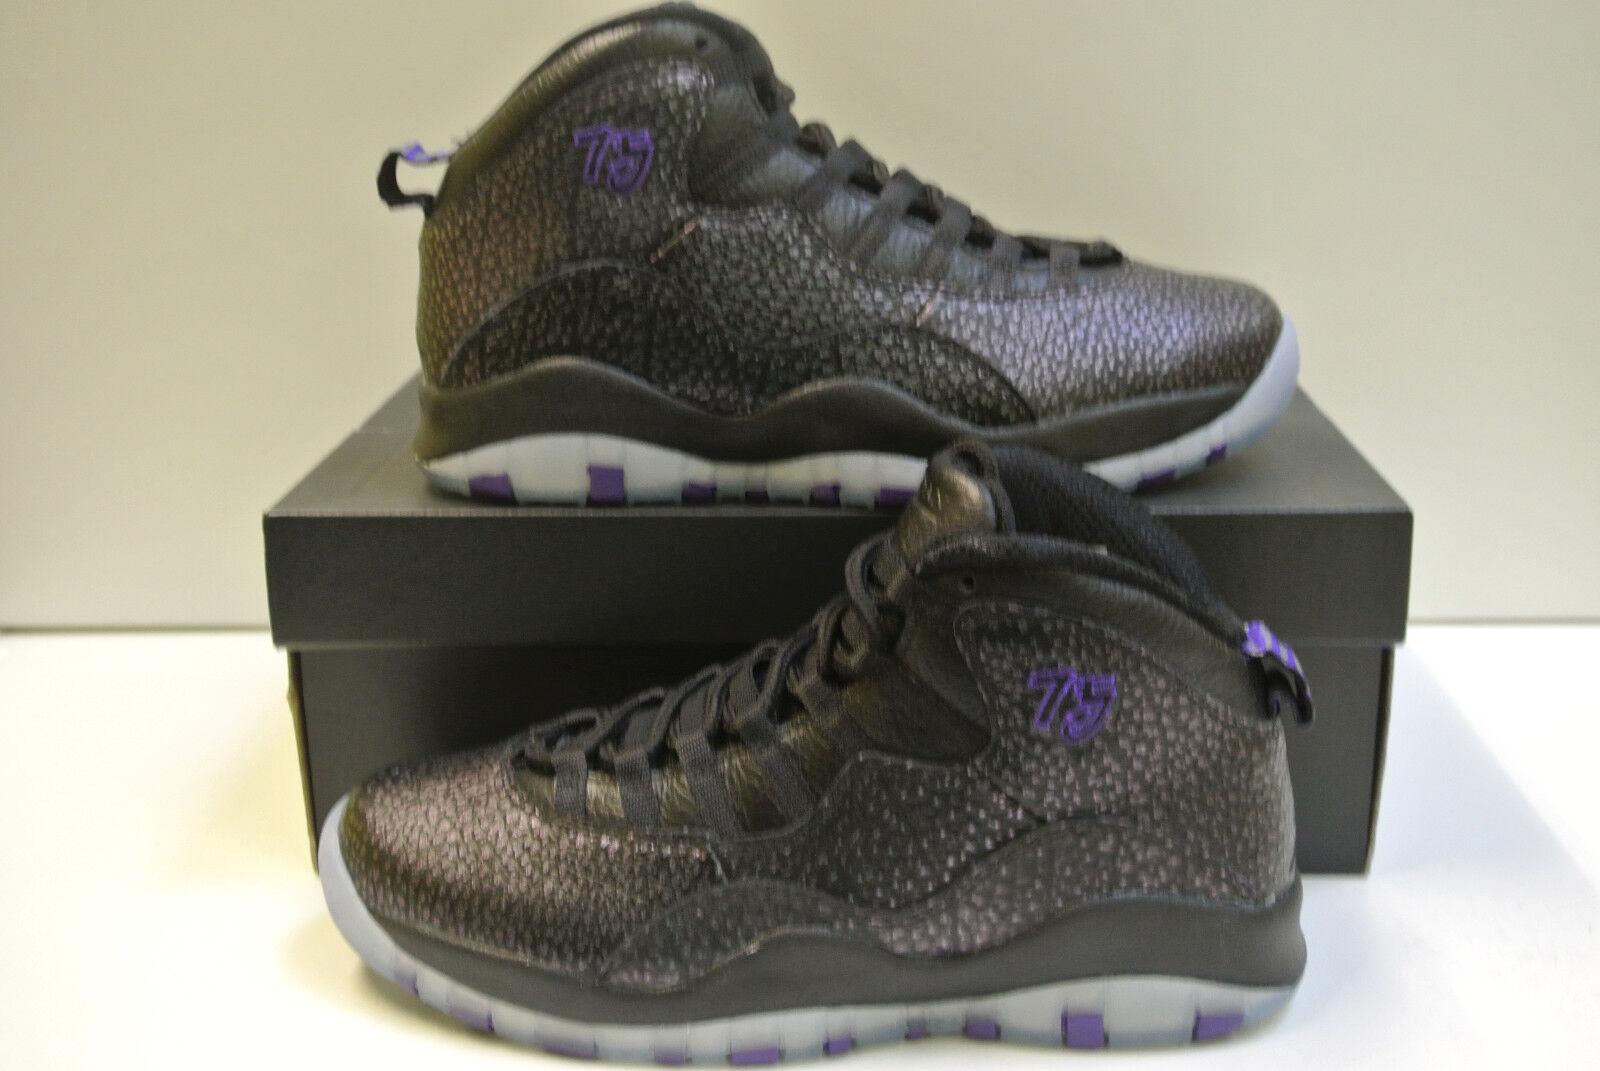 Nike Air Jordan 10 RETRO / 310805 ENUEVO Y EMB. orig. 310805 / 018 933147